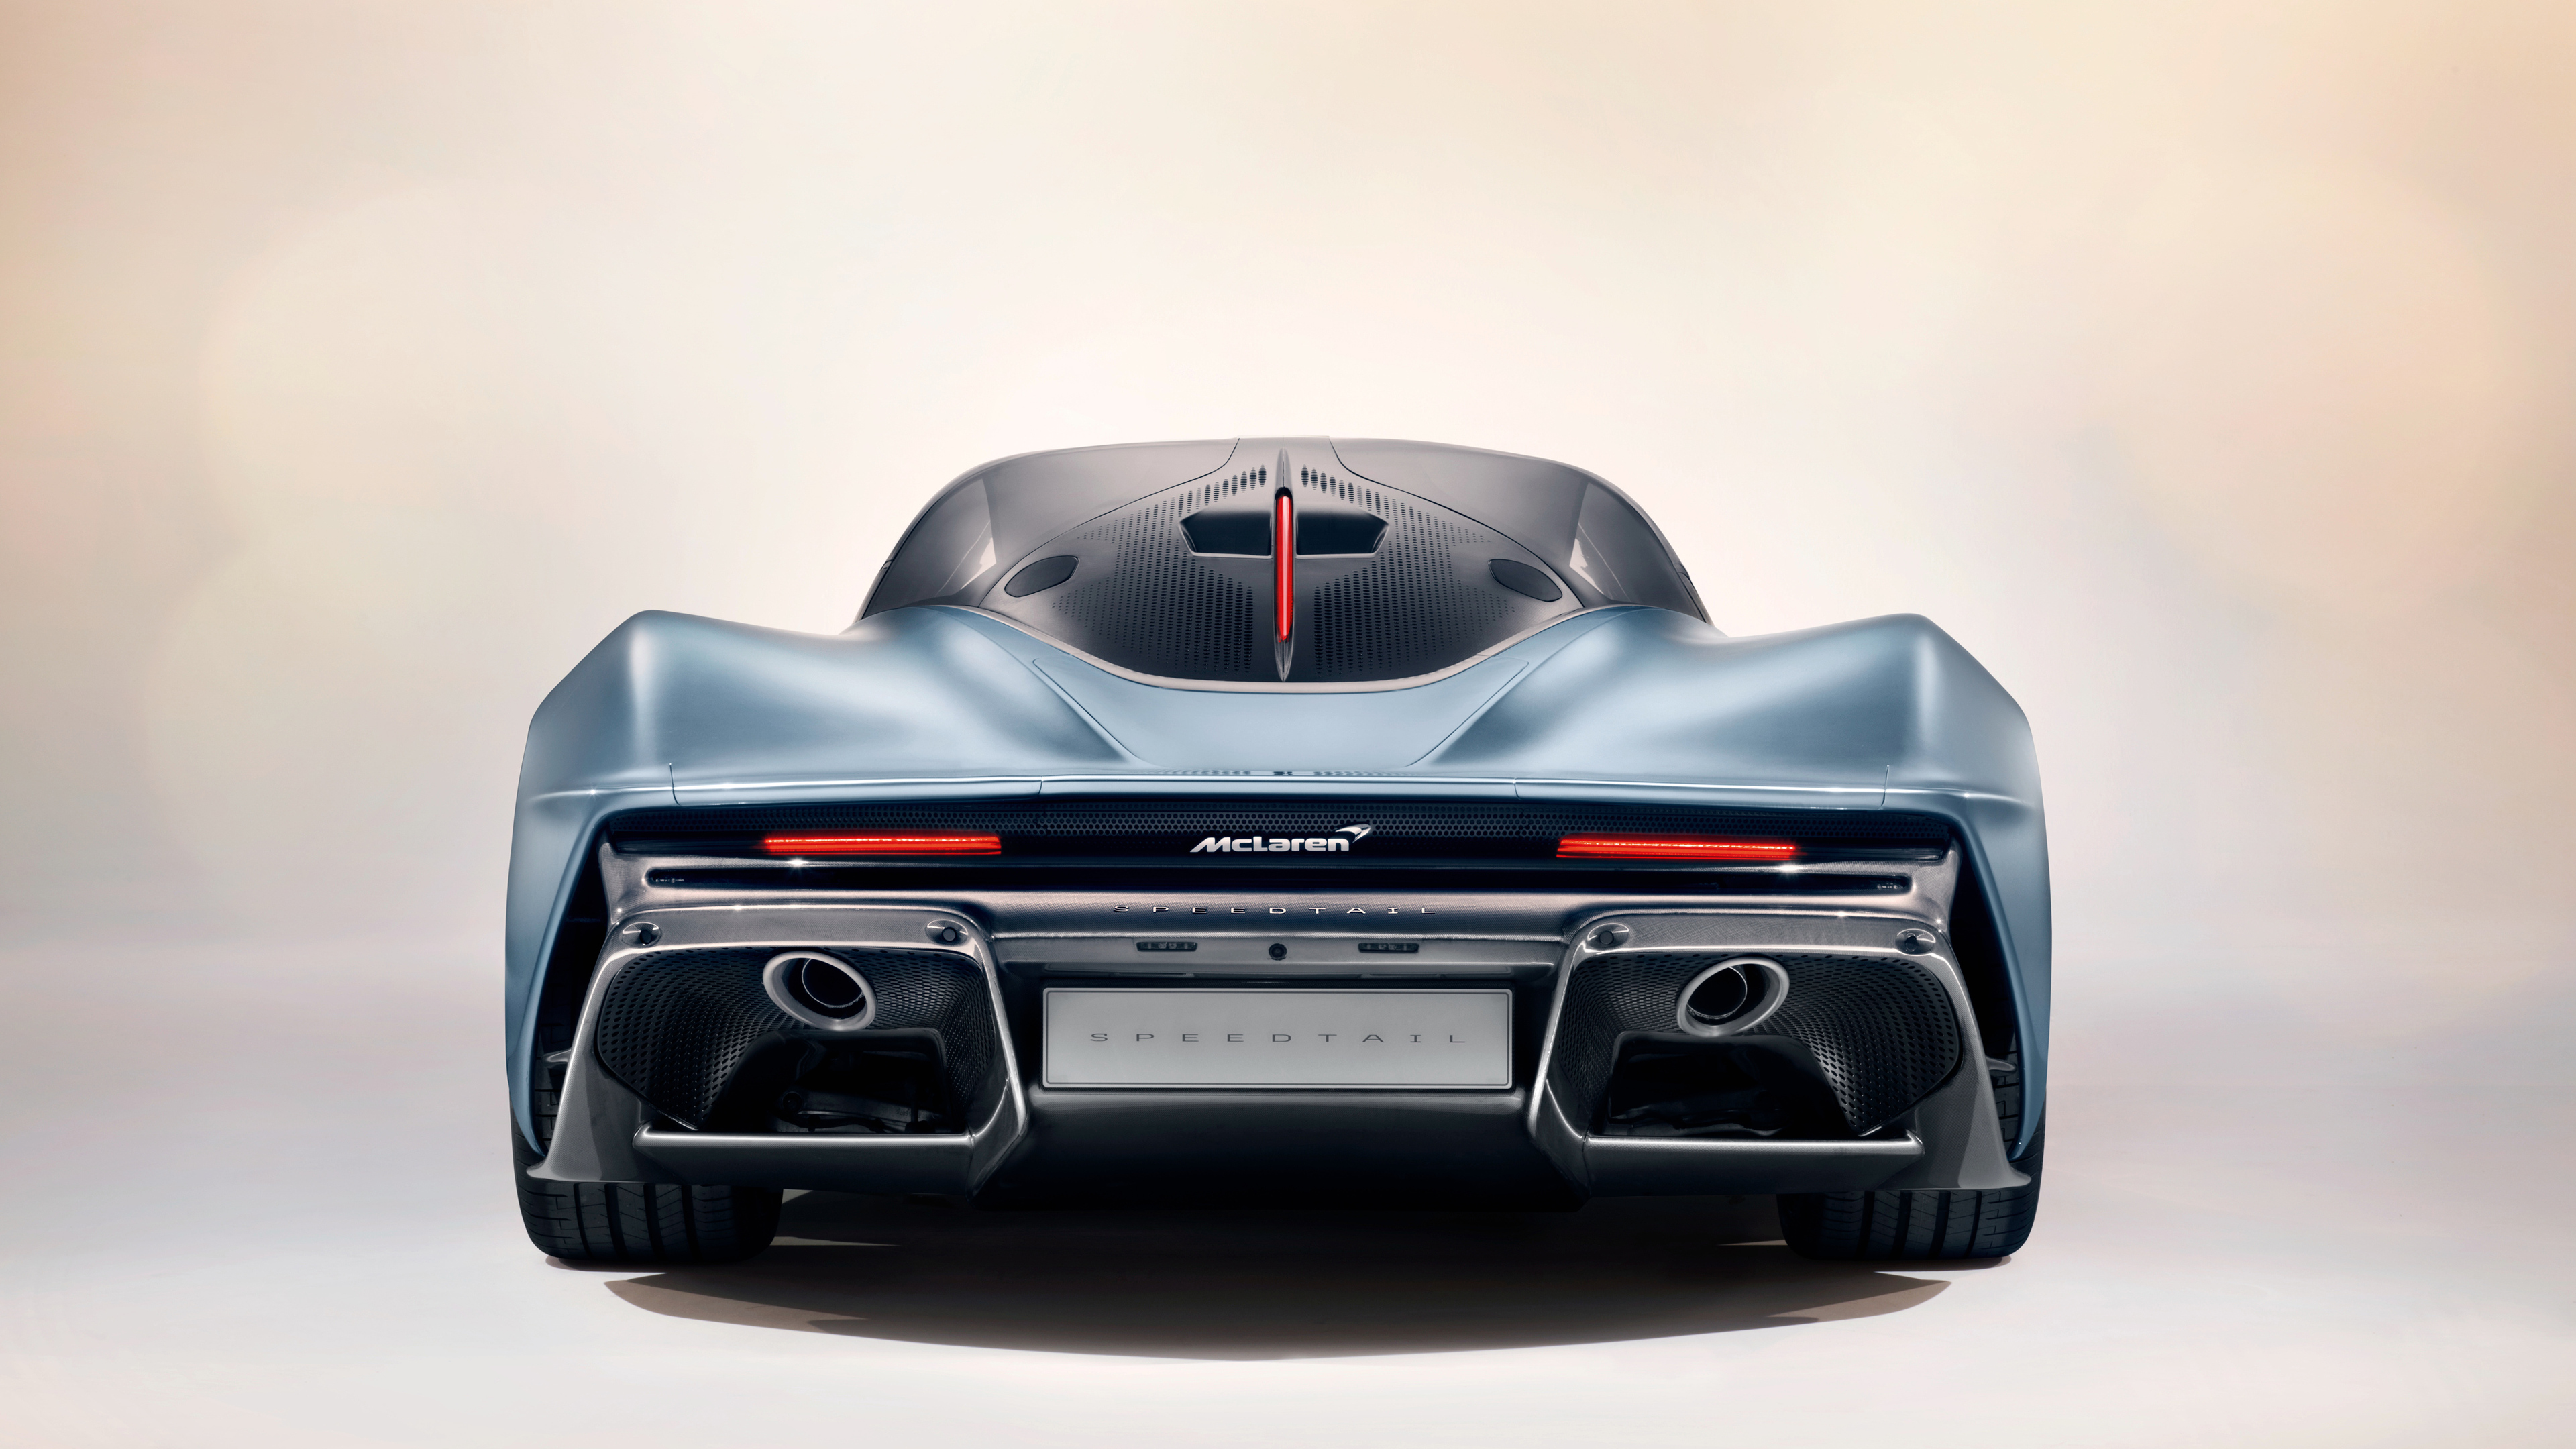 mclaren speedtail 2018 rear 1541969030 - McLaren Speedtail 2018 Rear - mclaren speedtail wallpapers, hd-wallpapers, cars wallpapers, 4k-wallpapers, 2018 cars wallpapers